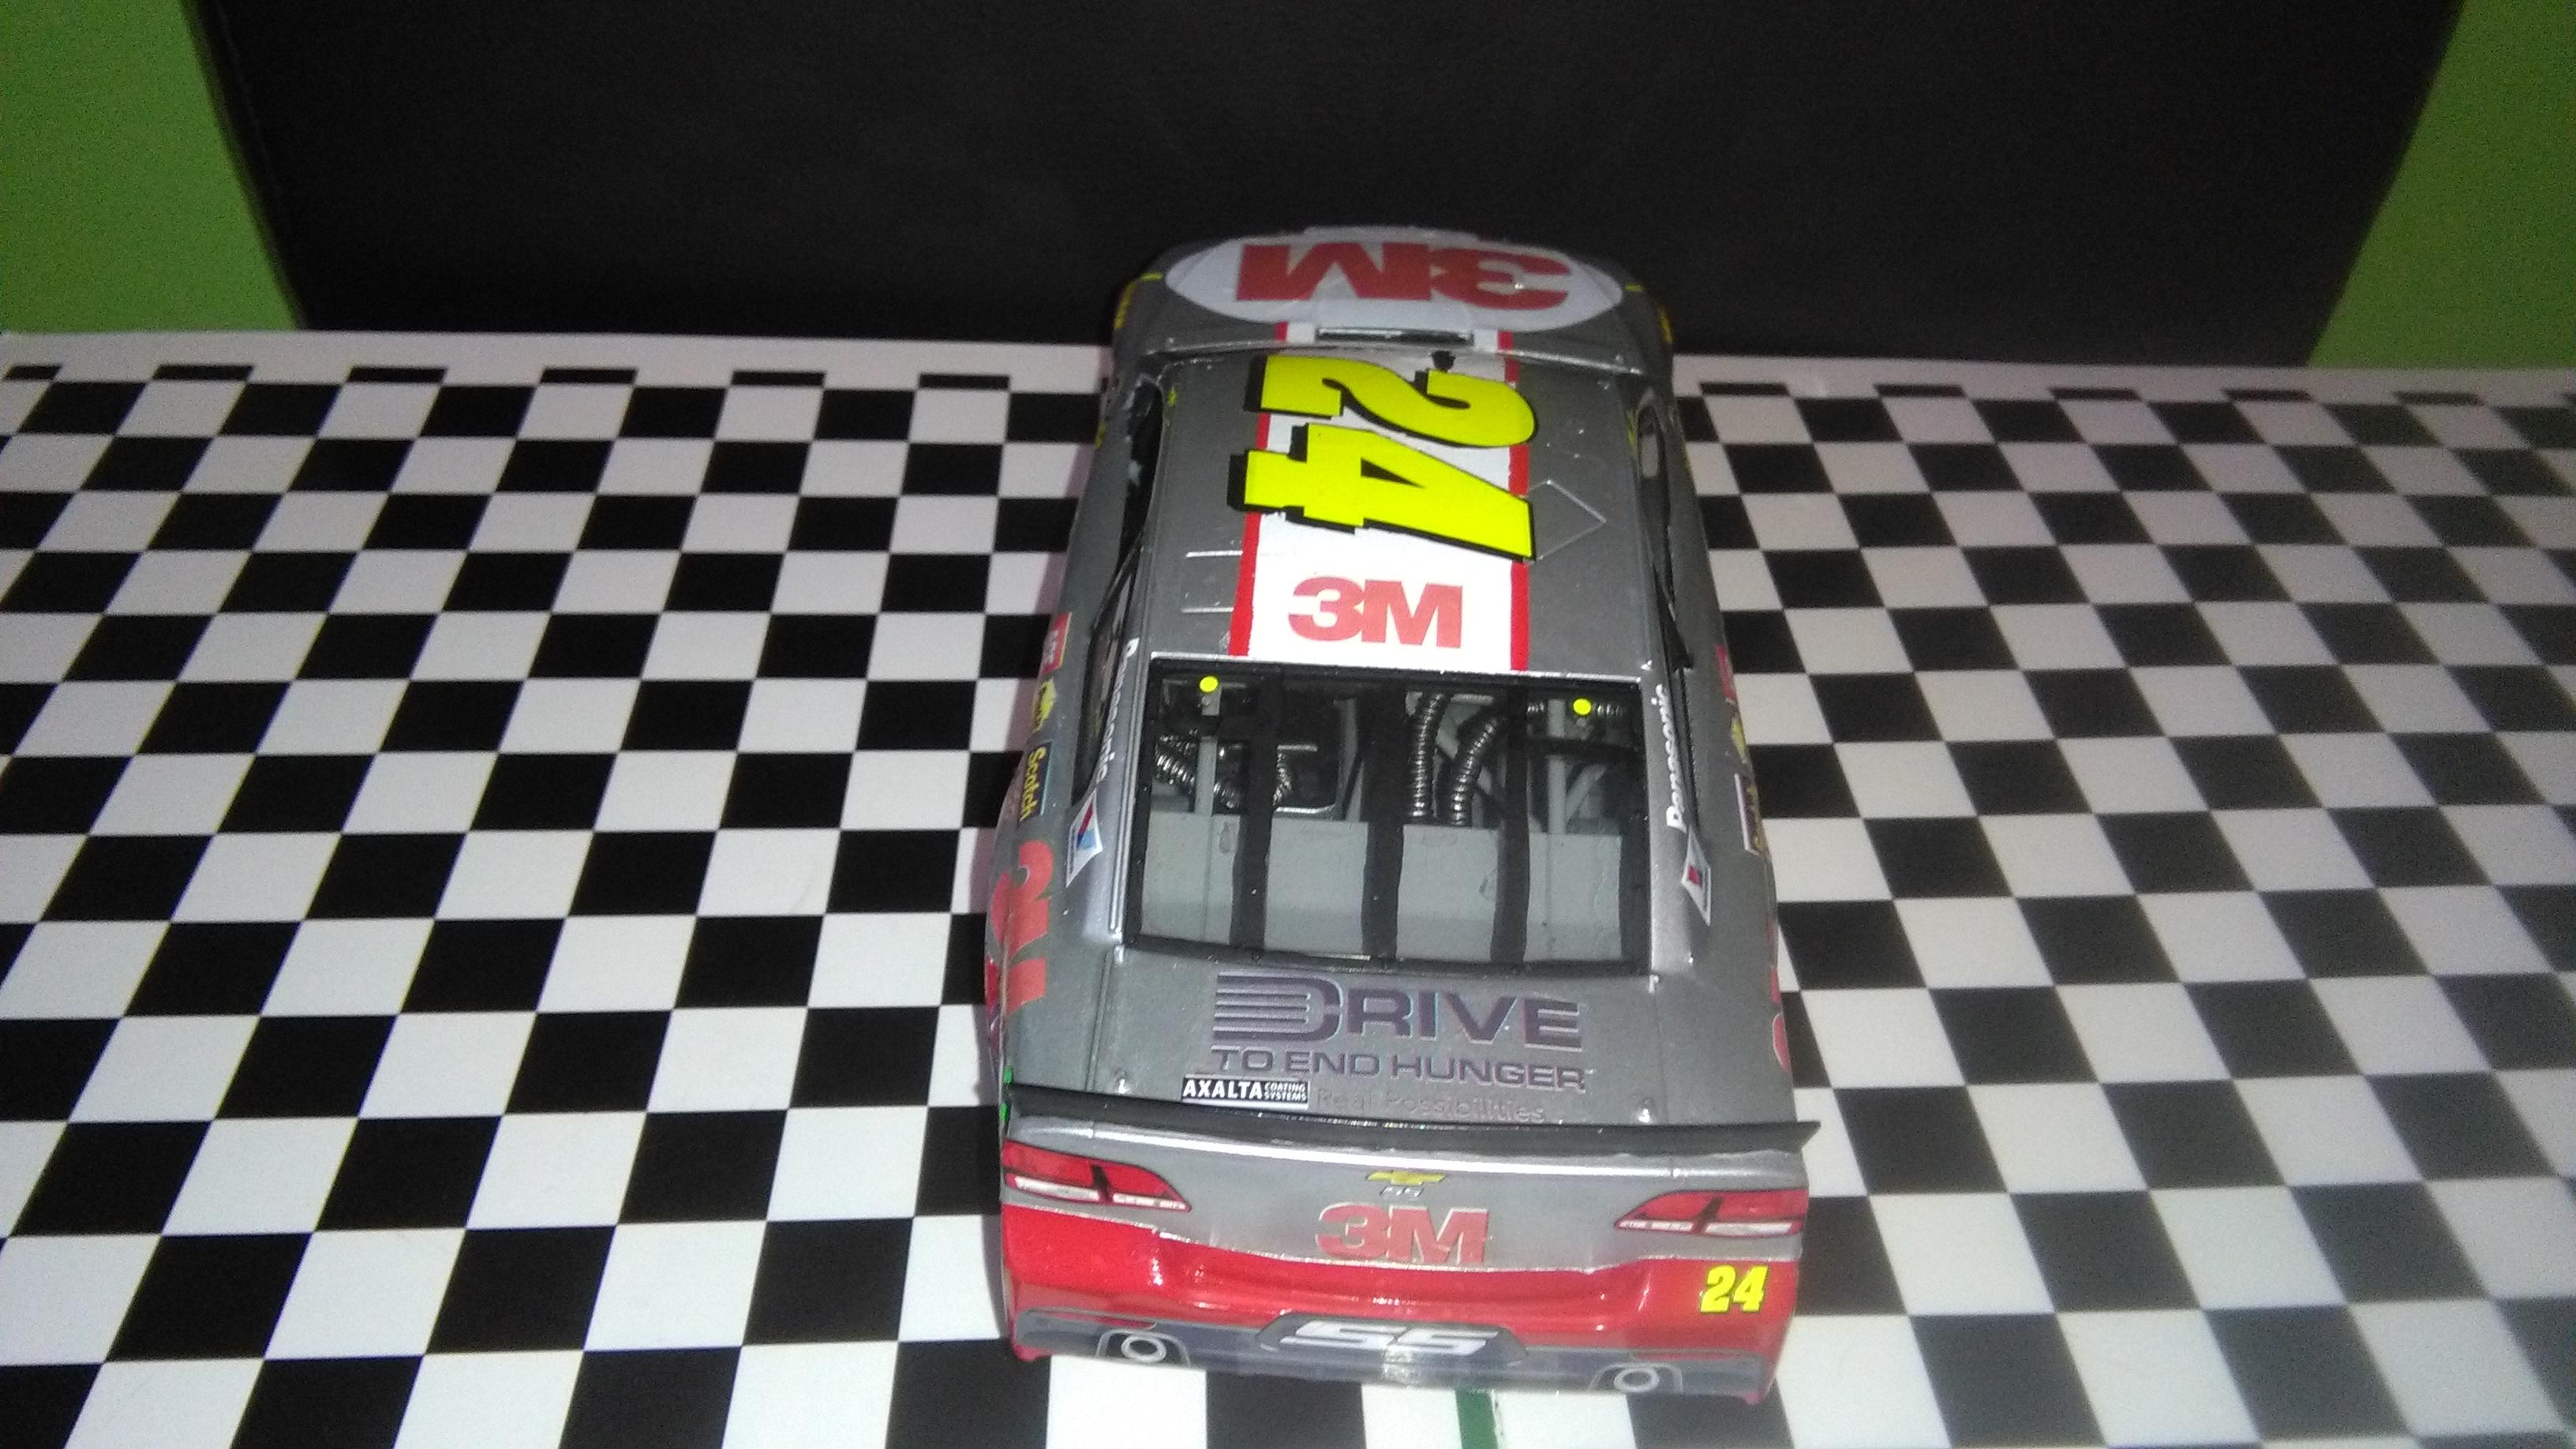 Chevrolet SS 2015 #24 Jeff Gordon 3M 822697IMG20170320183413